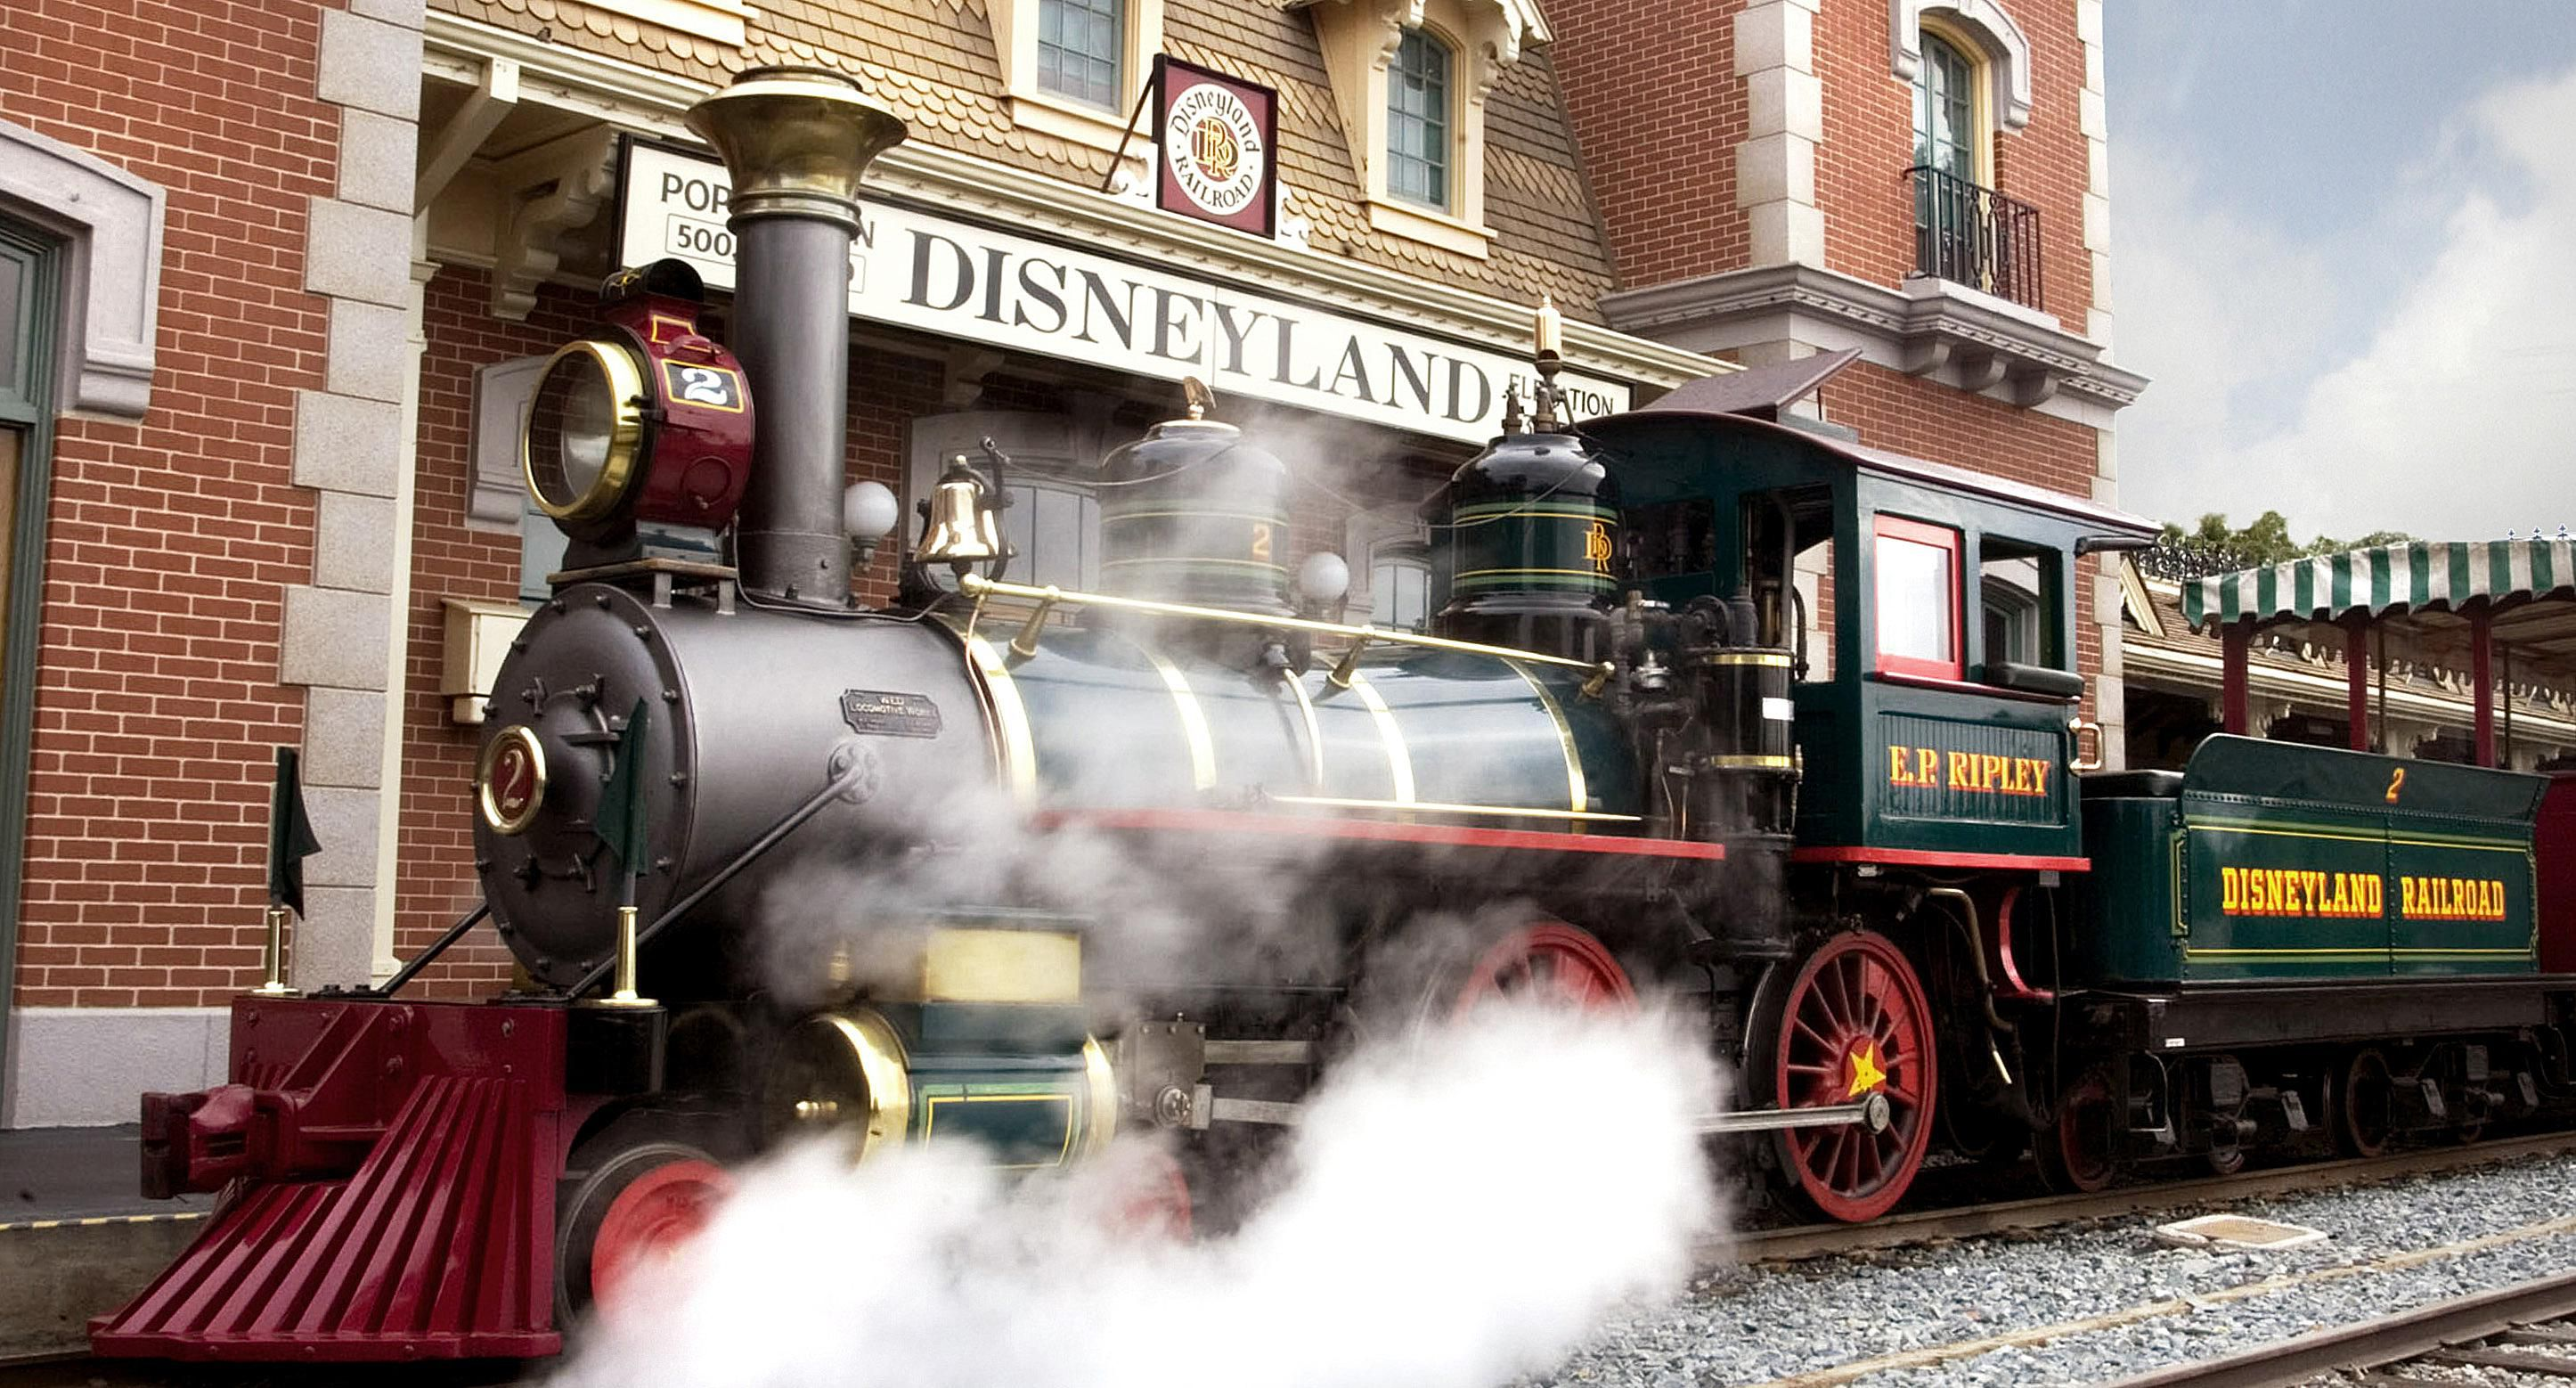 Disneyland-Railroad.jpg